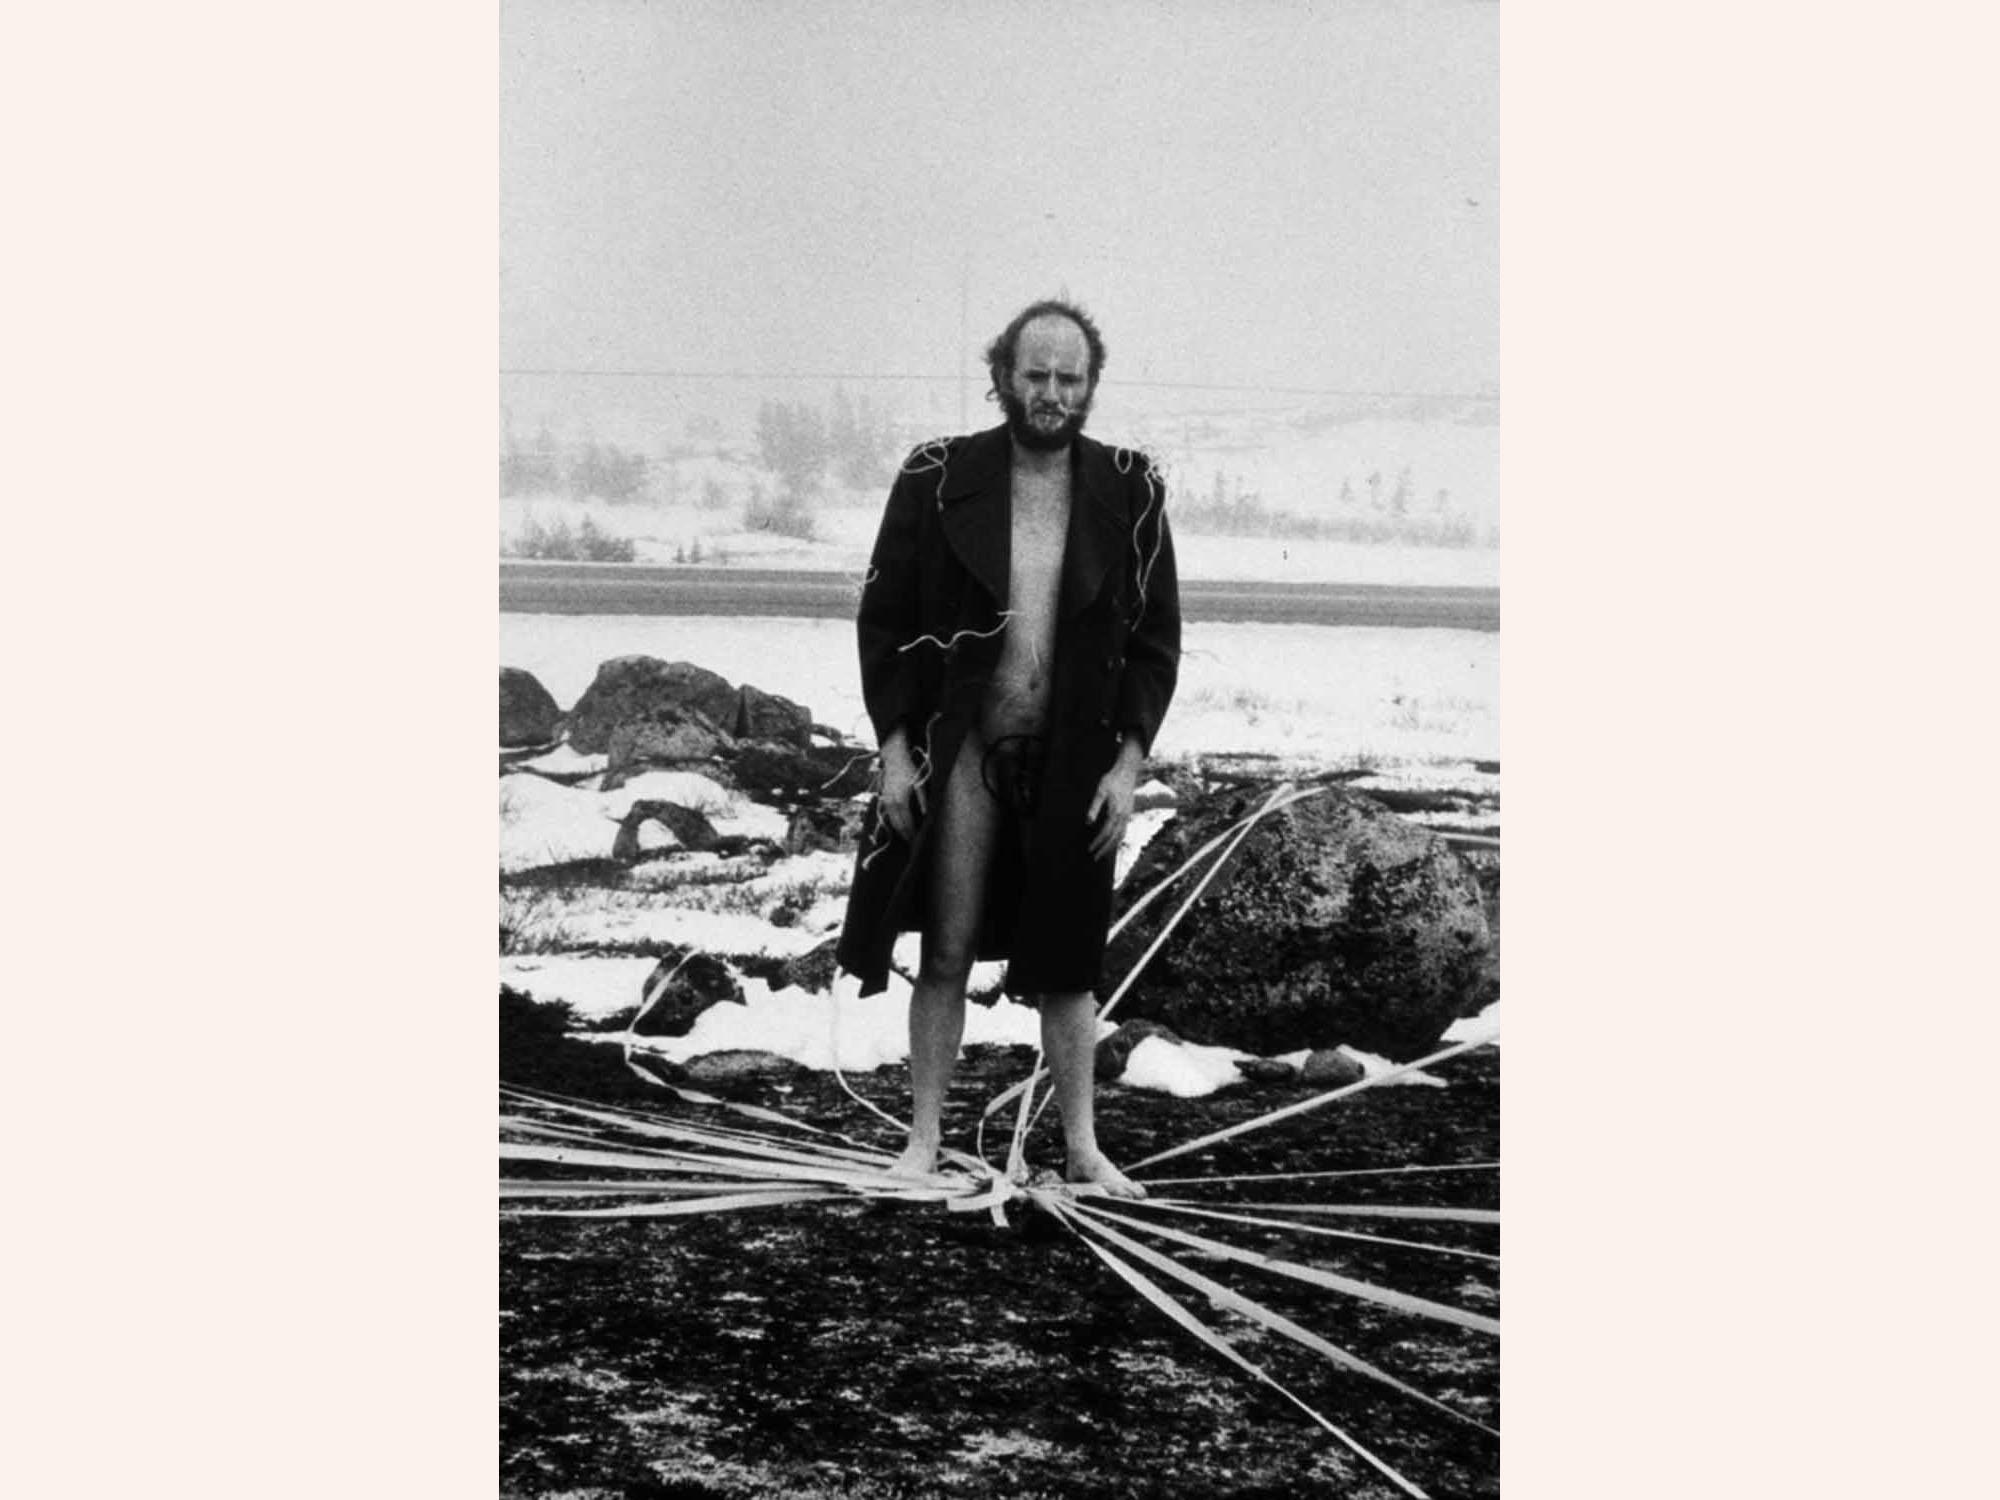 Alastair MacLennan - 1971 Performance - Nr Peggy's Cove, Nova Scotia, Canada © The Alastair MacLennan Archive : Locus+